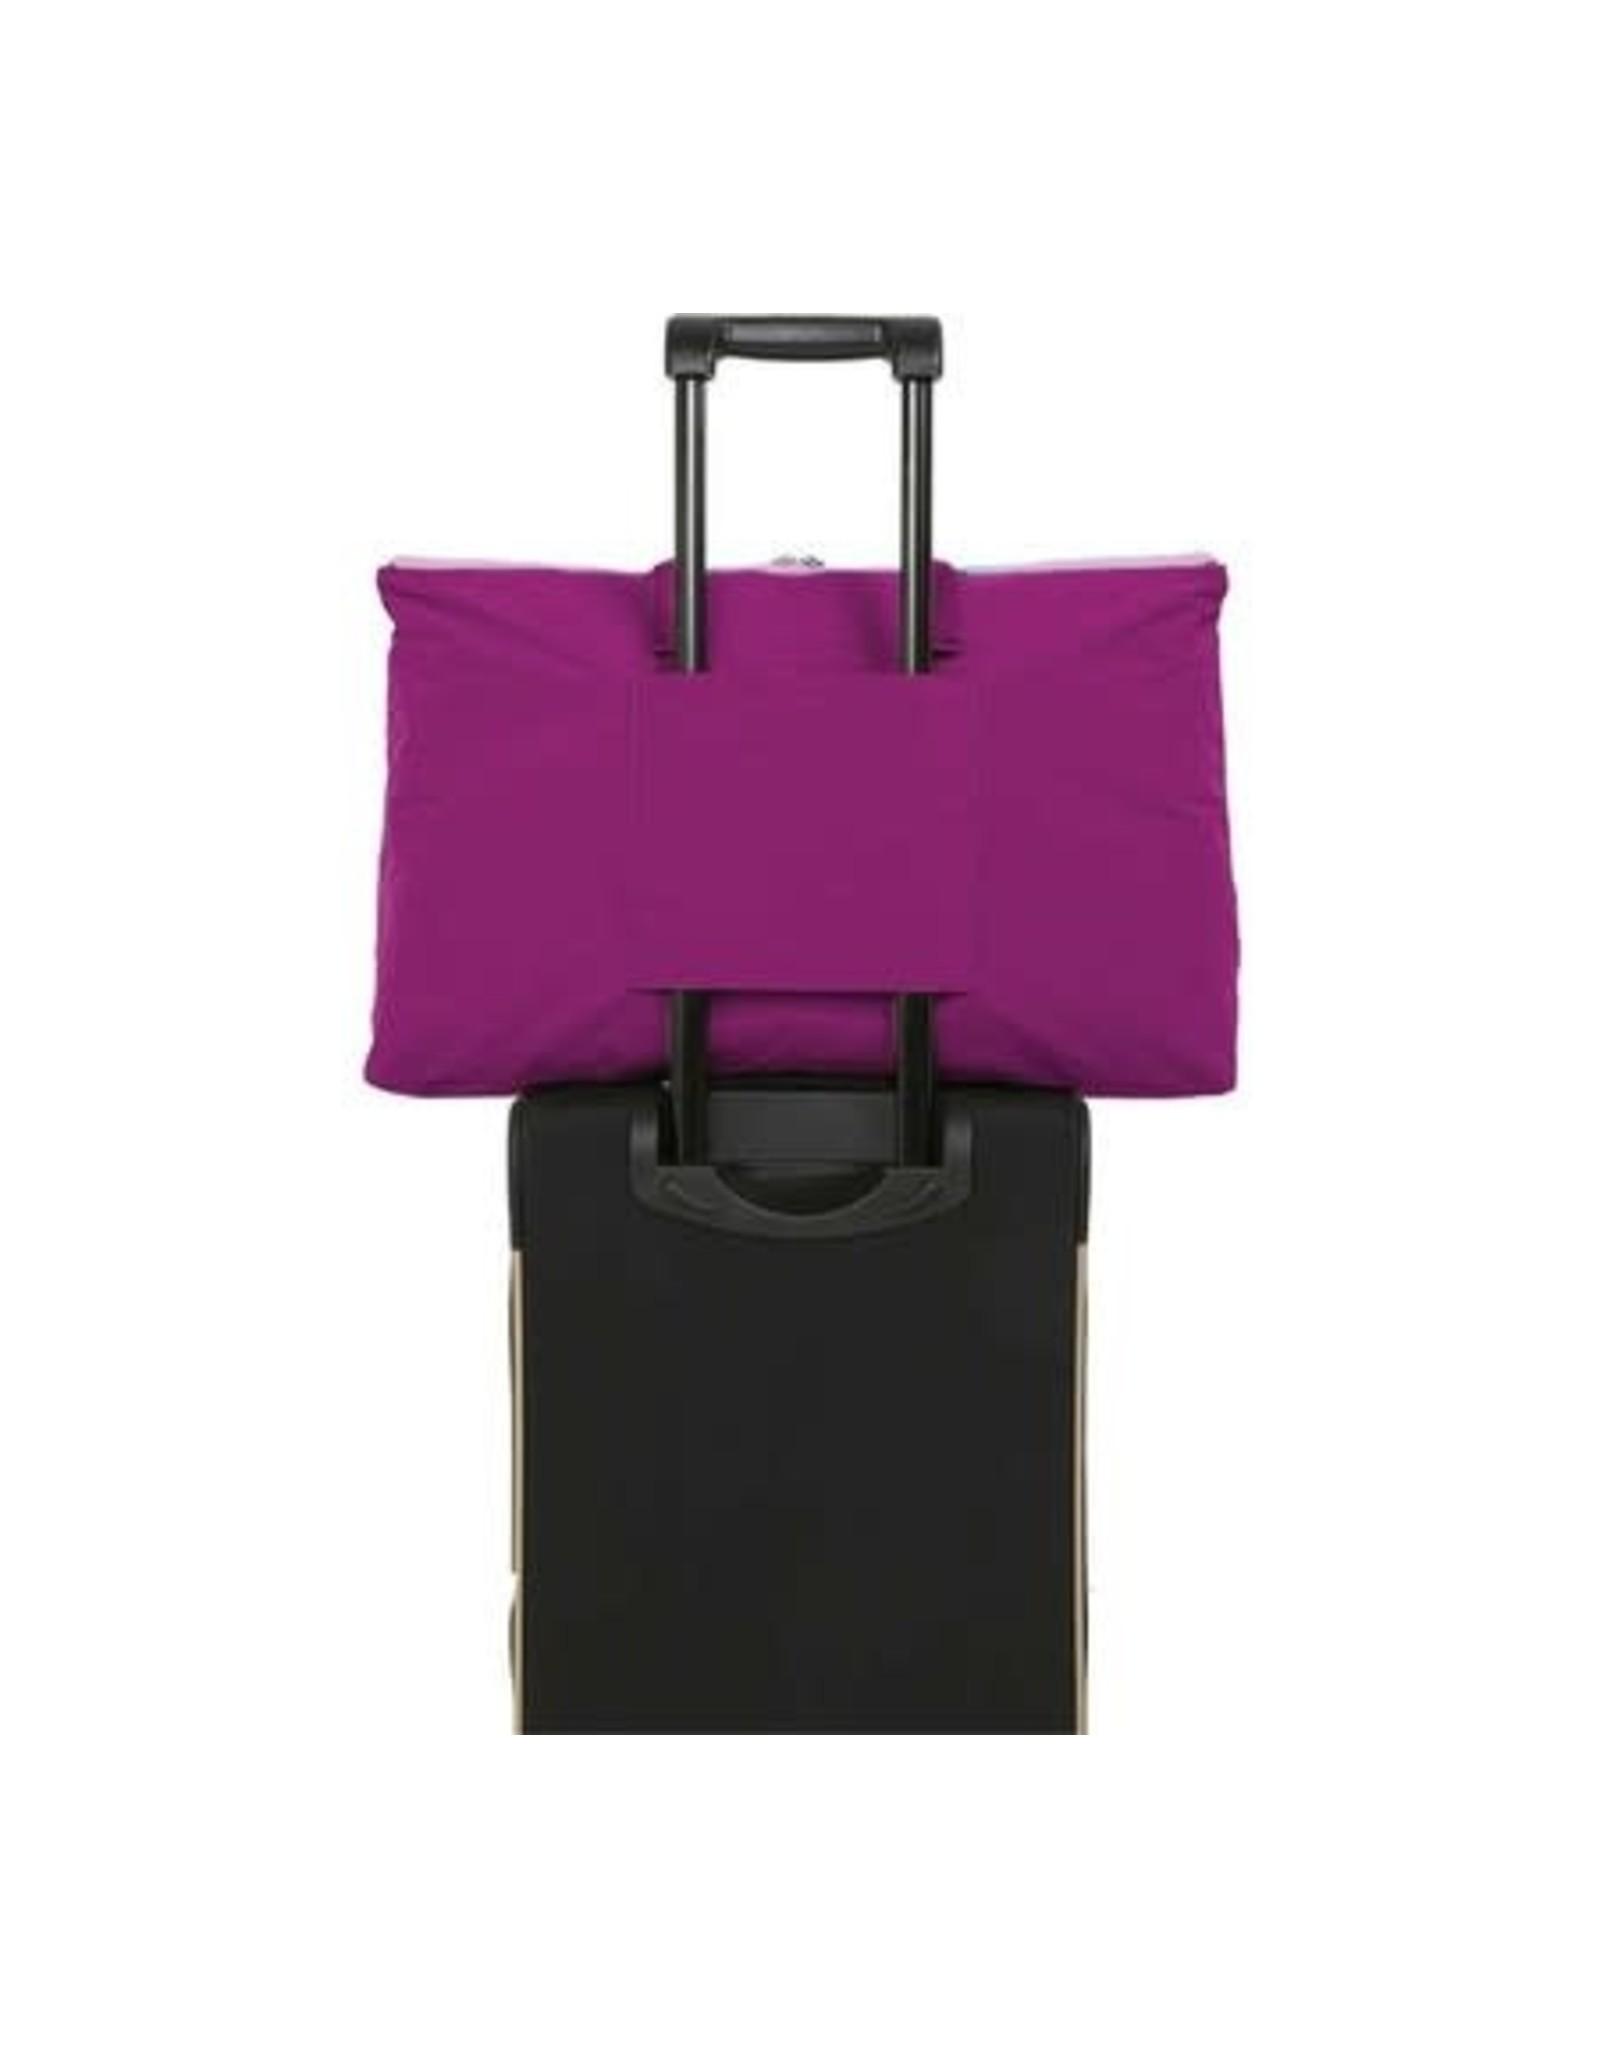 Baggallini Foldable Travel Tote